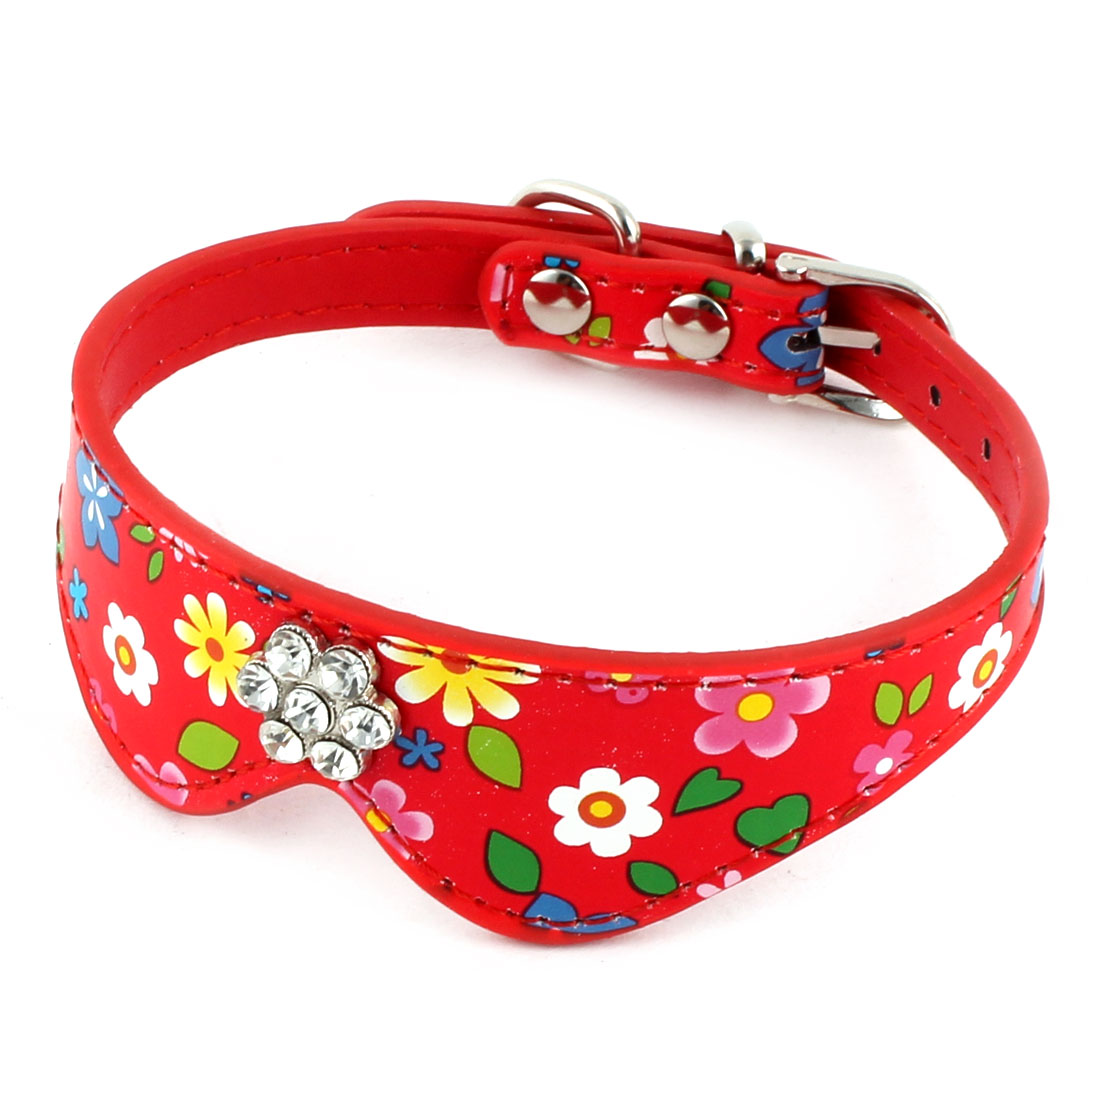 Pet Dog Cat Tie Shaped Flower Pattern Single Pin Buckle Belt Collar Strap Red